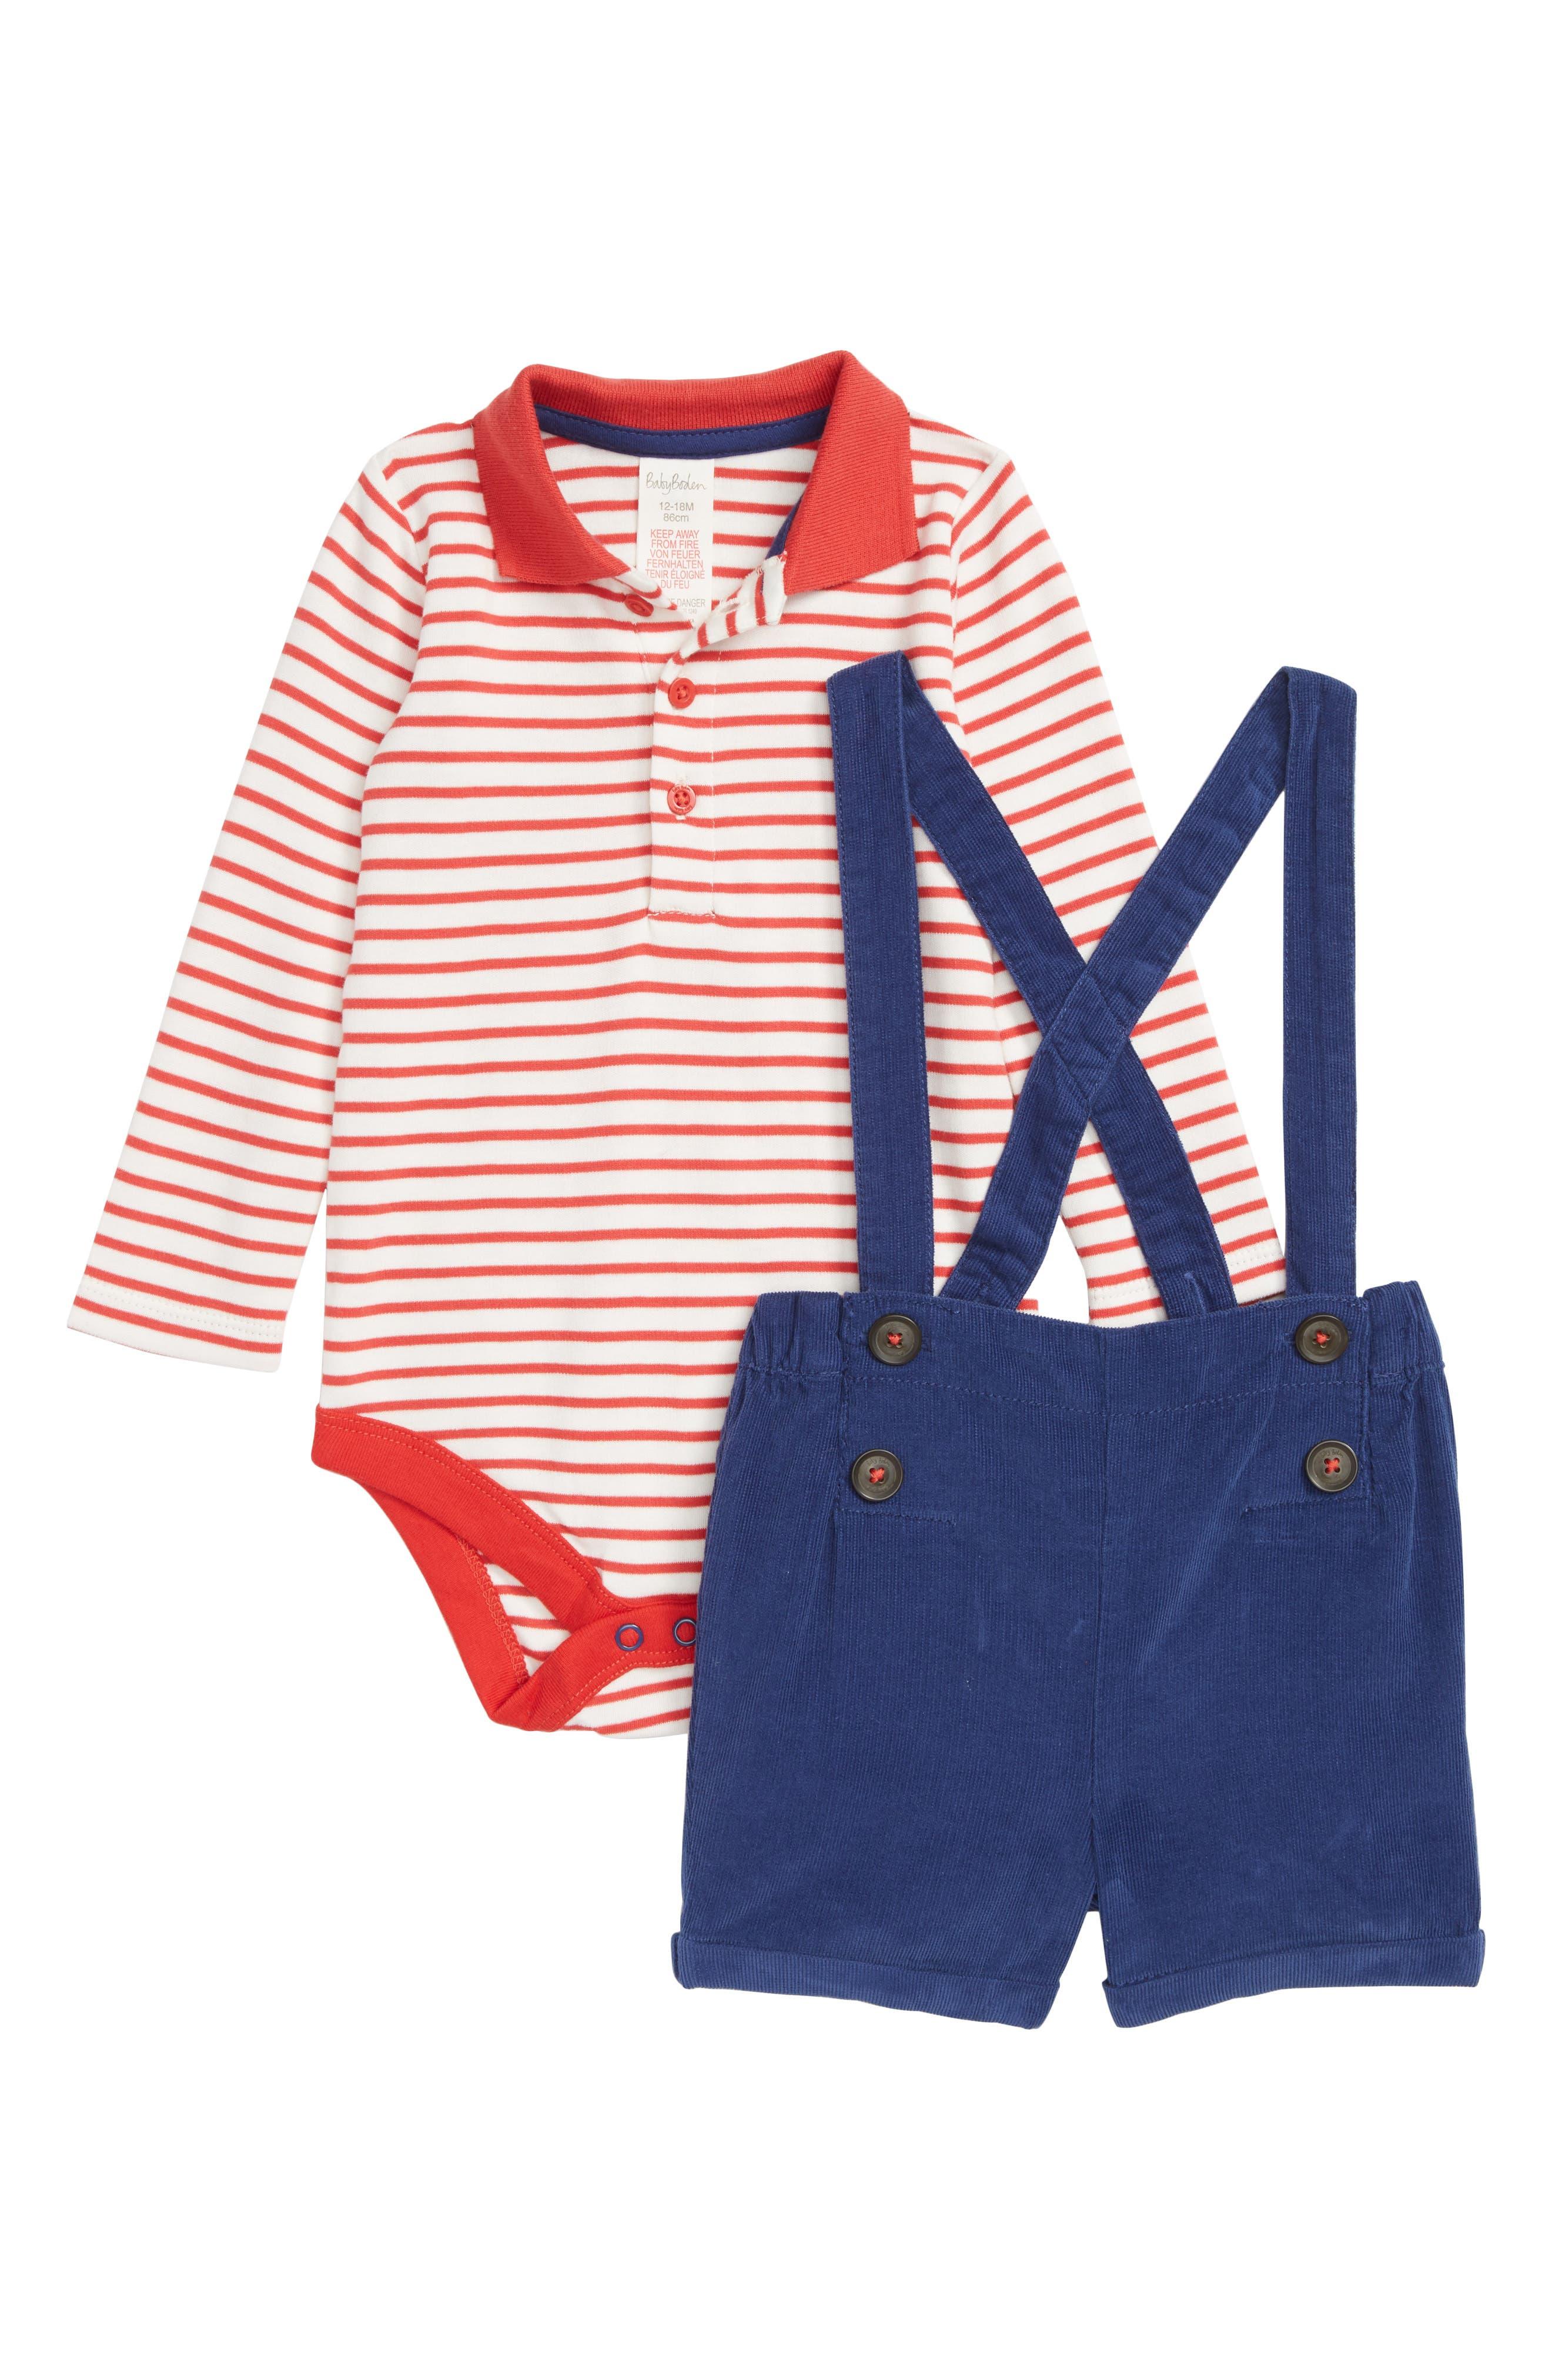 Nostalgic Bodysuit & Suspender Shorts Set,                             Main thumbnail 1, color,                             ENGINE RED